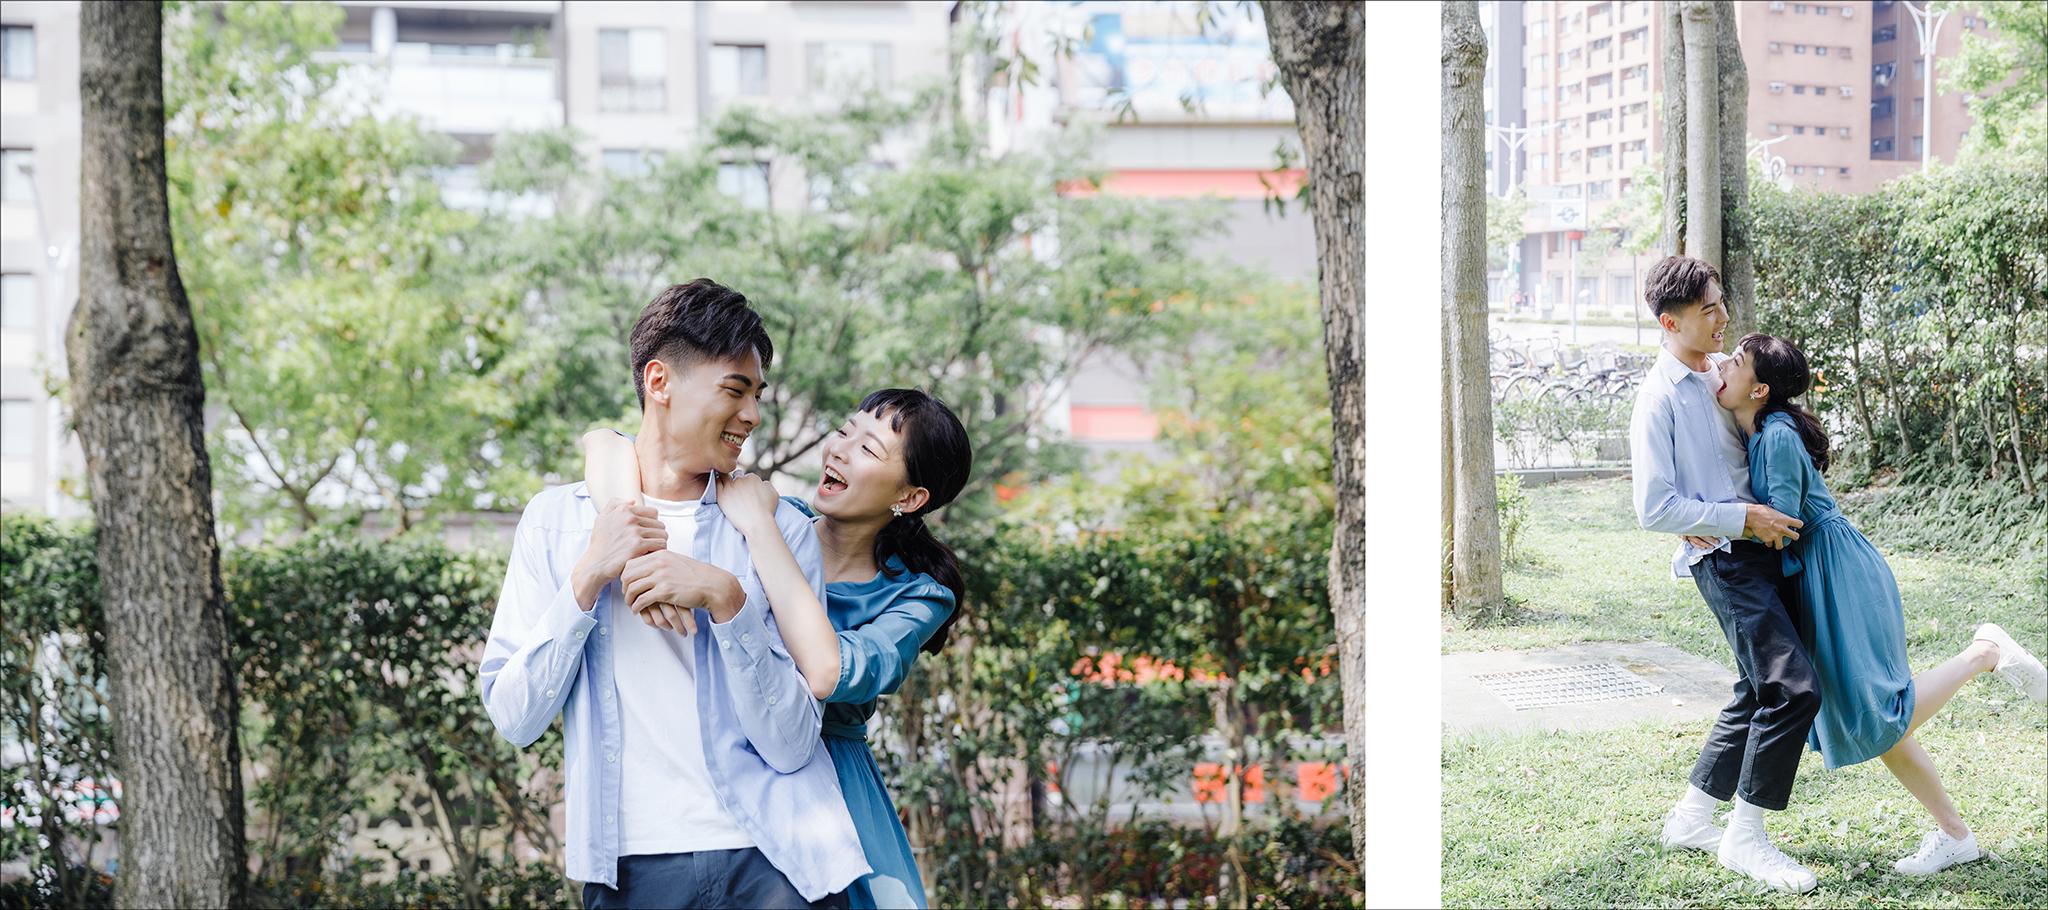 49817508363 e1cce883dc o - 【自助婚紗】+允宥&珮嘉+